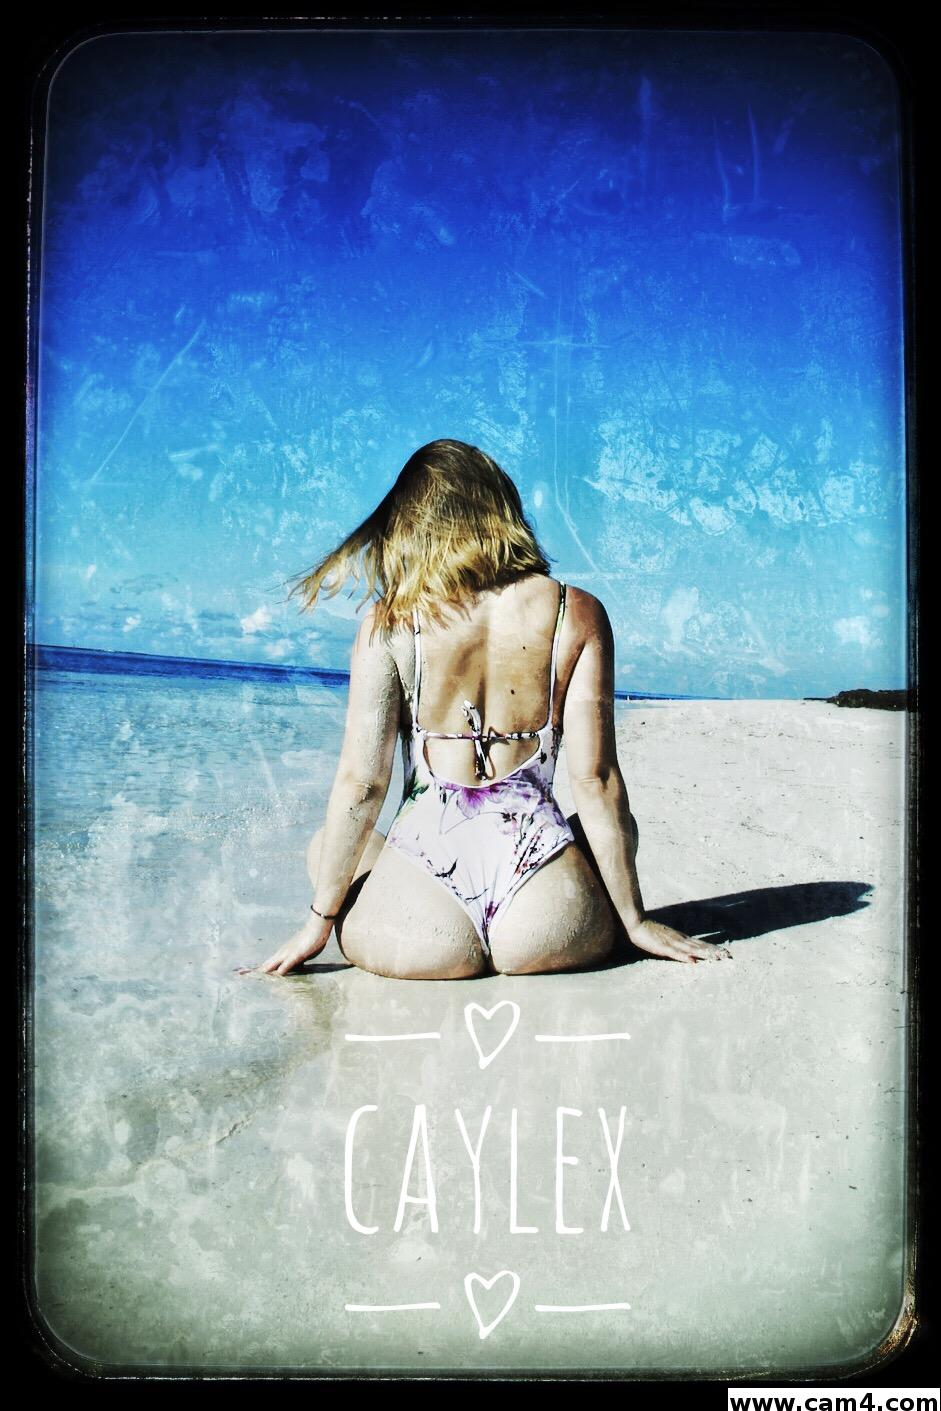 Caylex1?s=nh5pbw2ax6bq4gplh8nfmt2h8re2i0ffr3xz1zhw4wi=